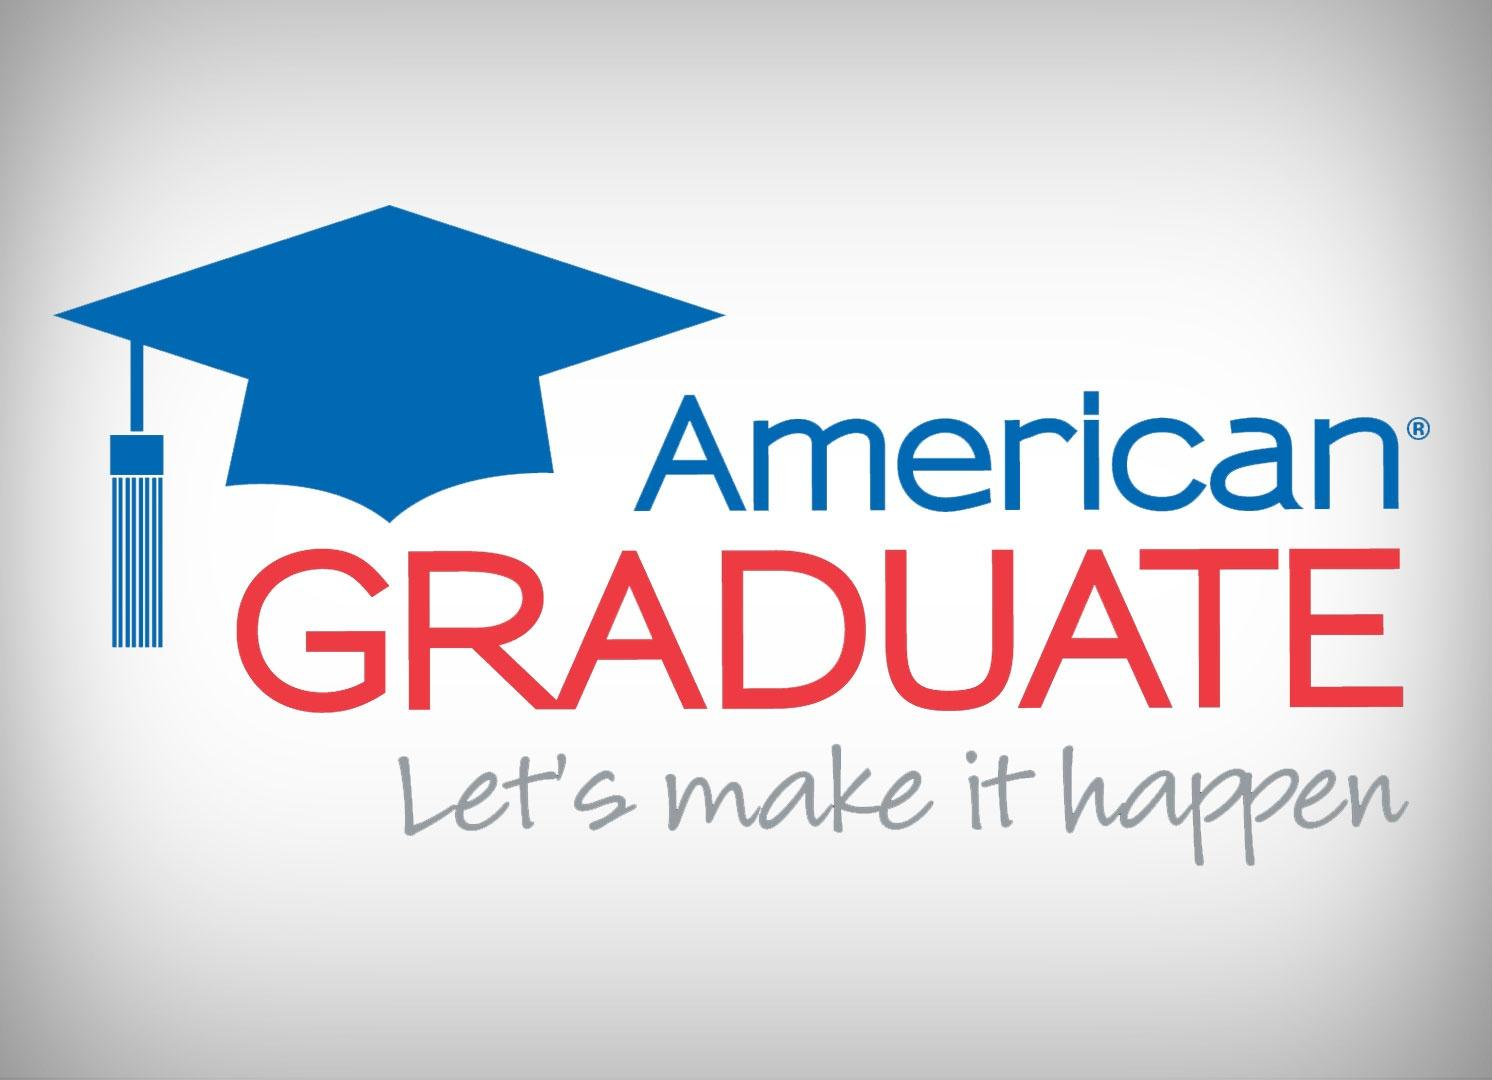 American Graduate - Let's make it happen